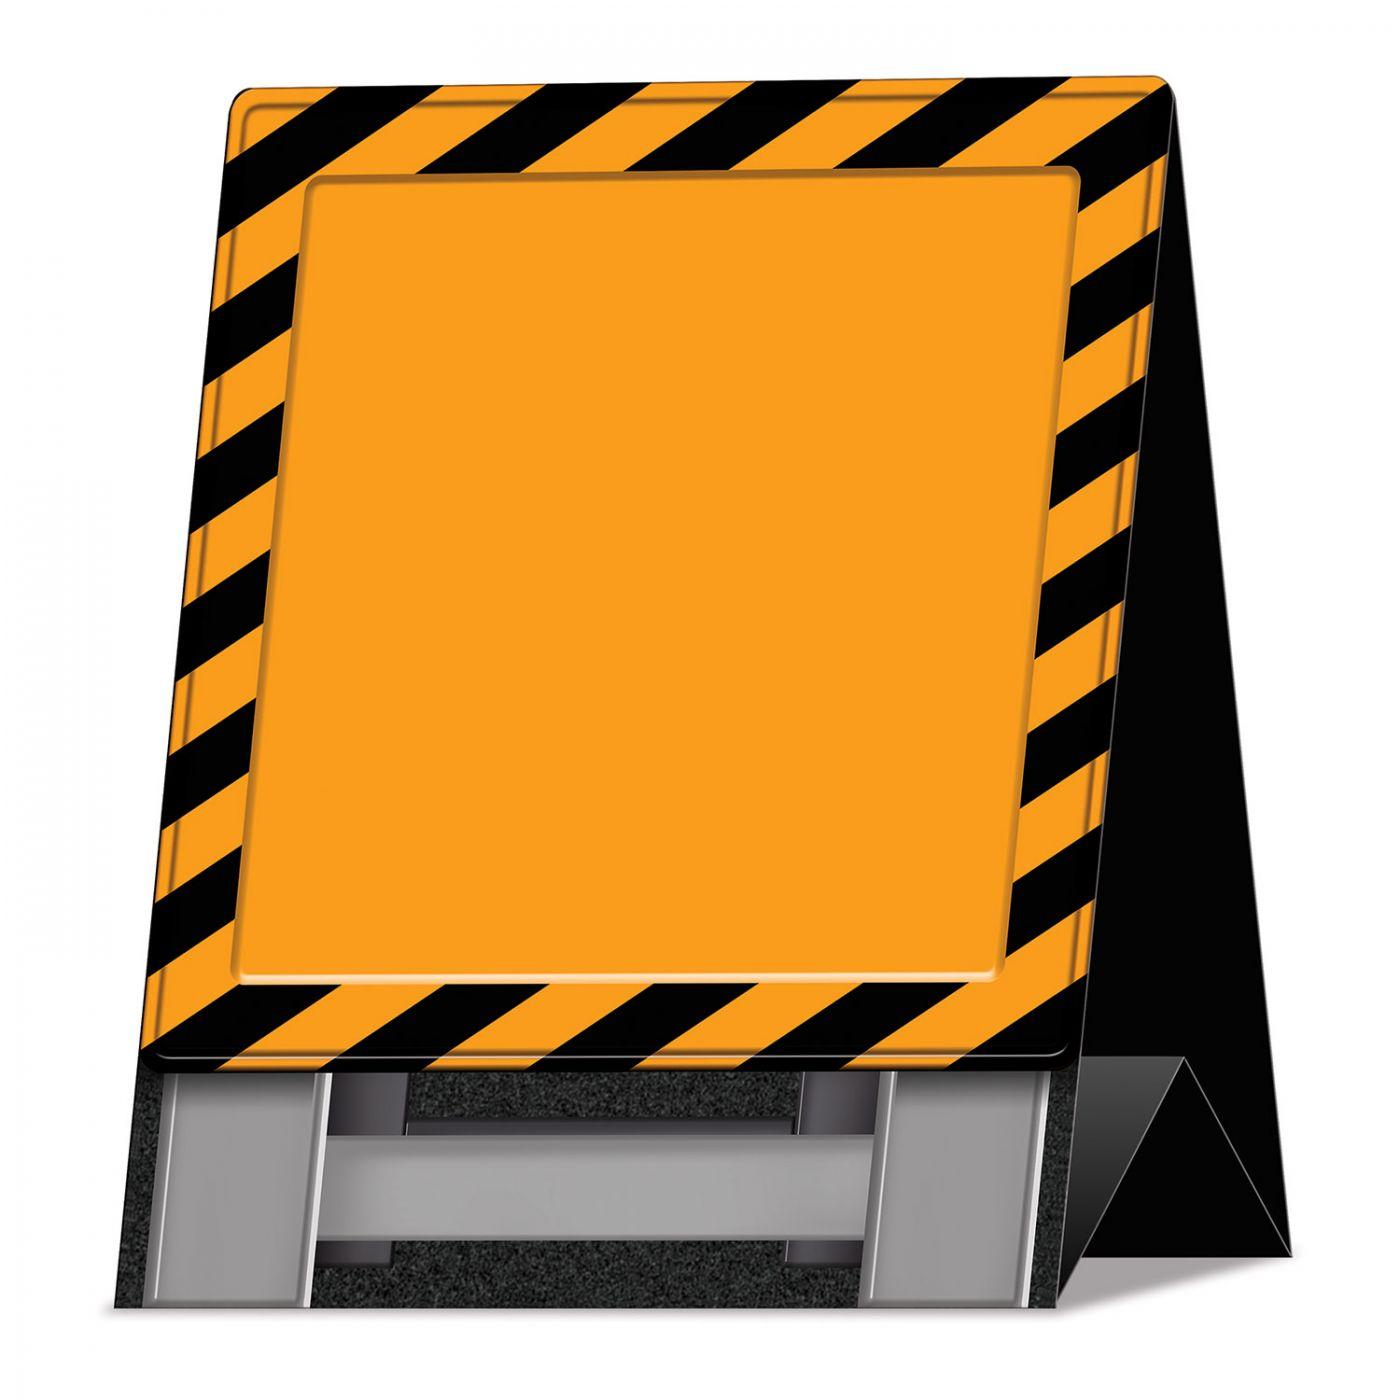 3-D Construction Barricade Centerpiece image